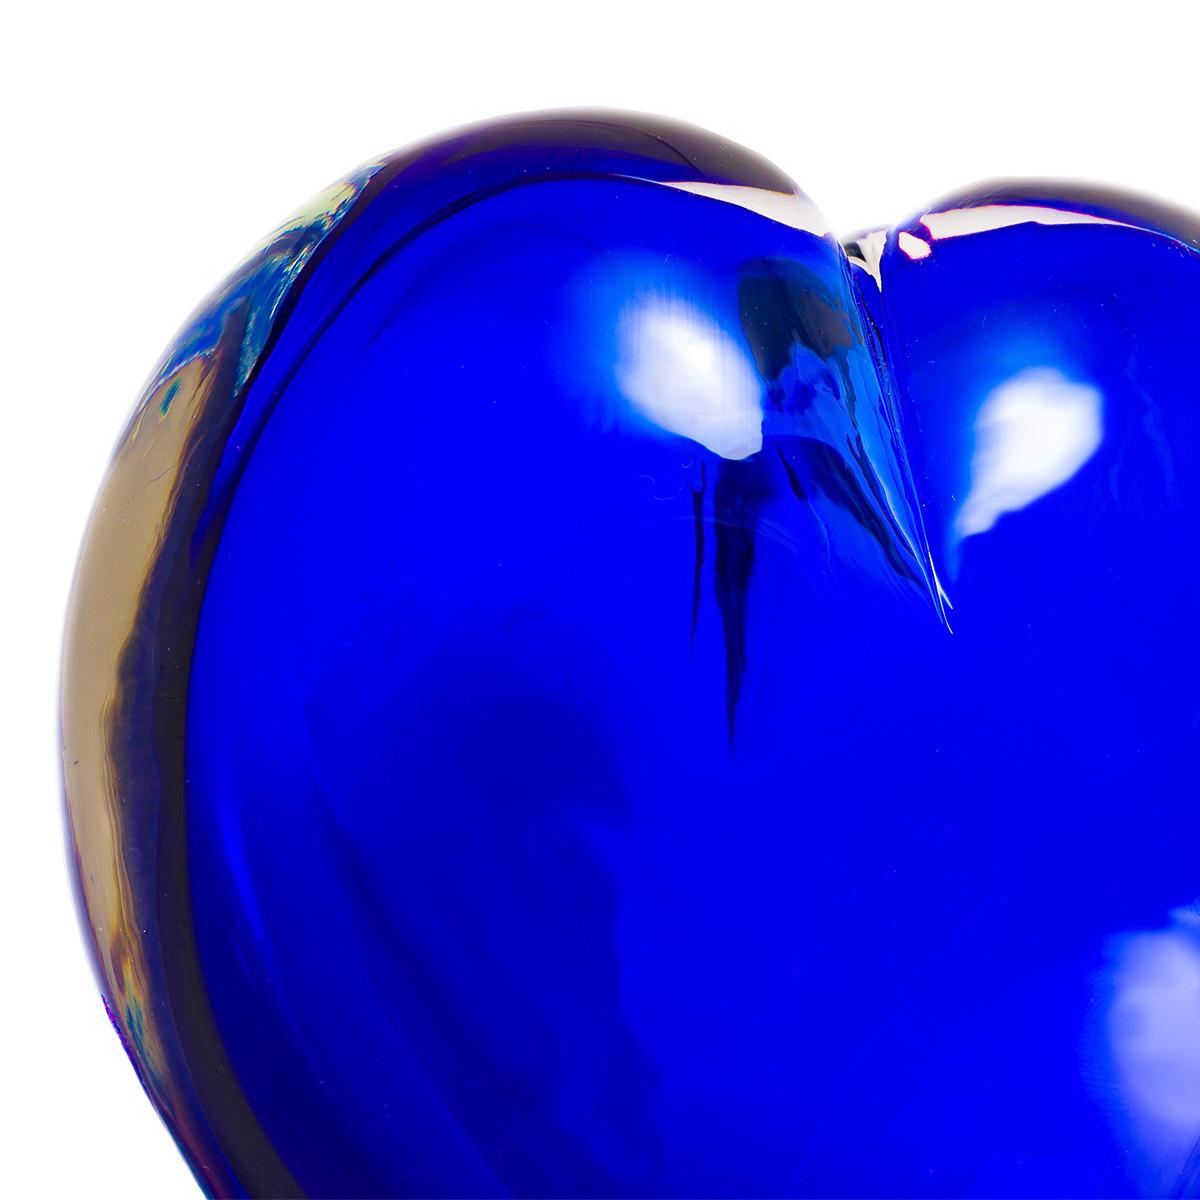 blue-detail-royal-blue-murano-glass-giberto-design